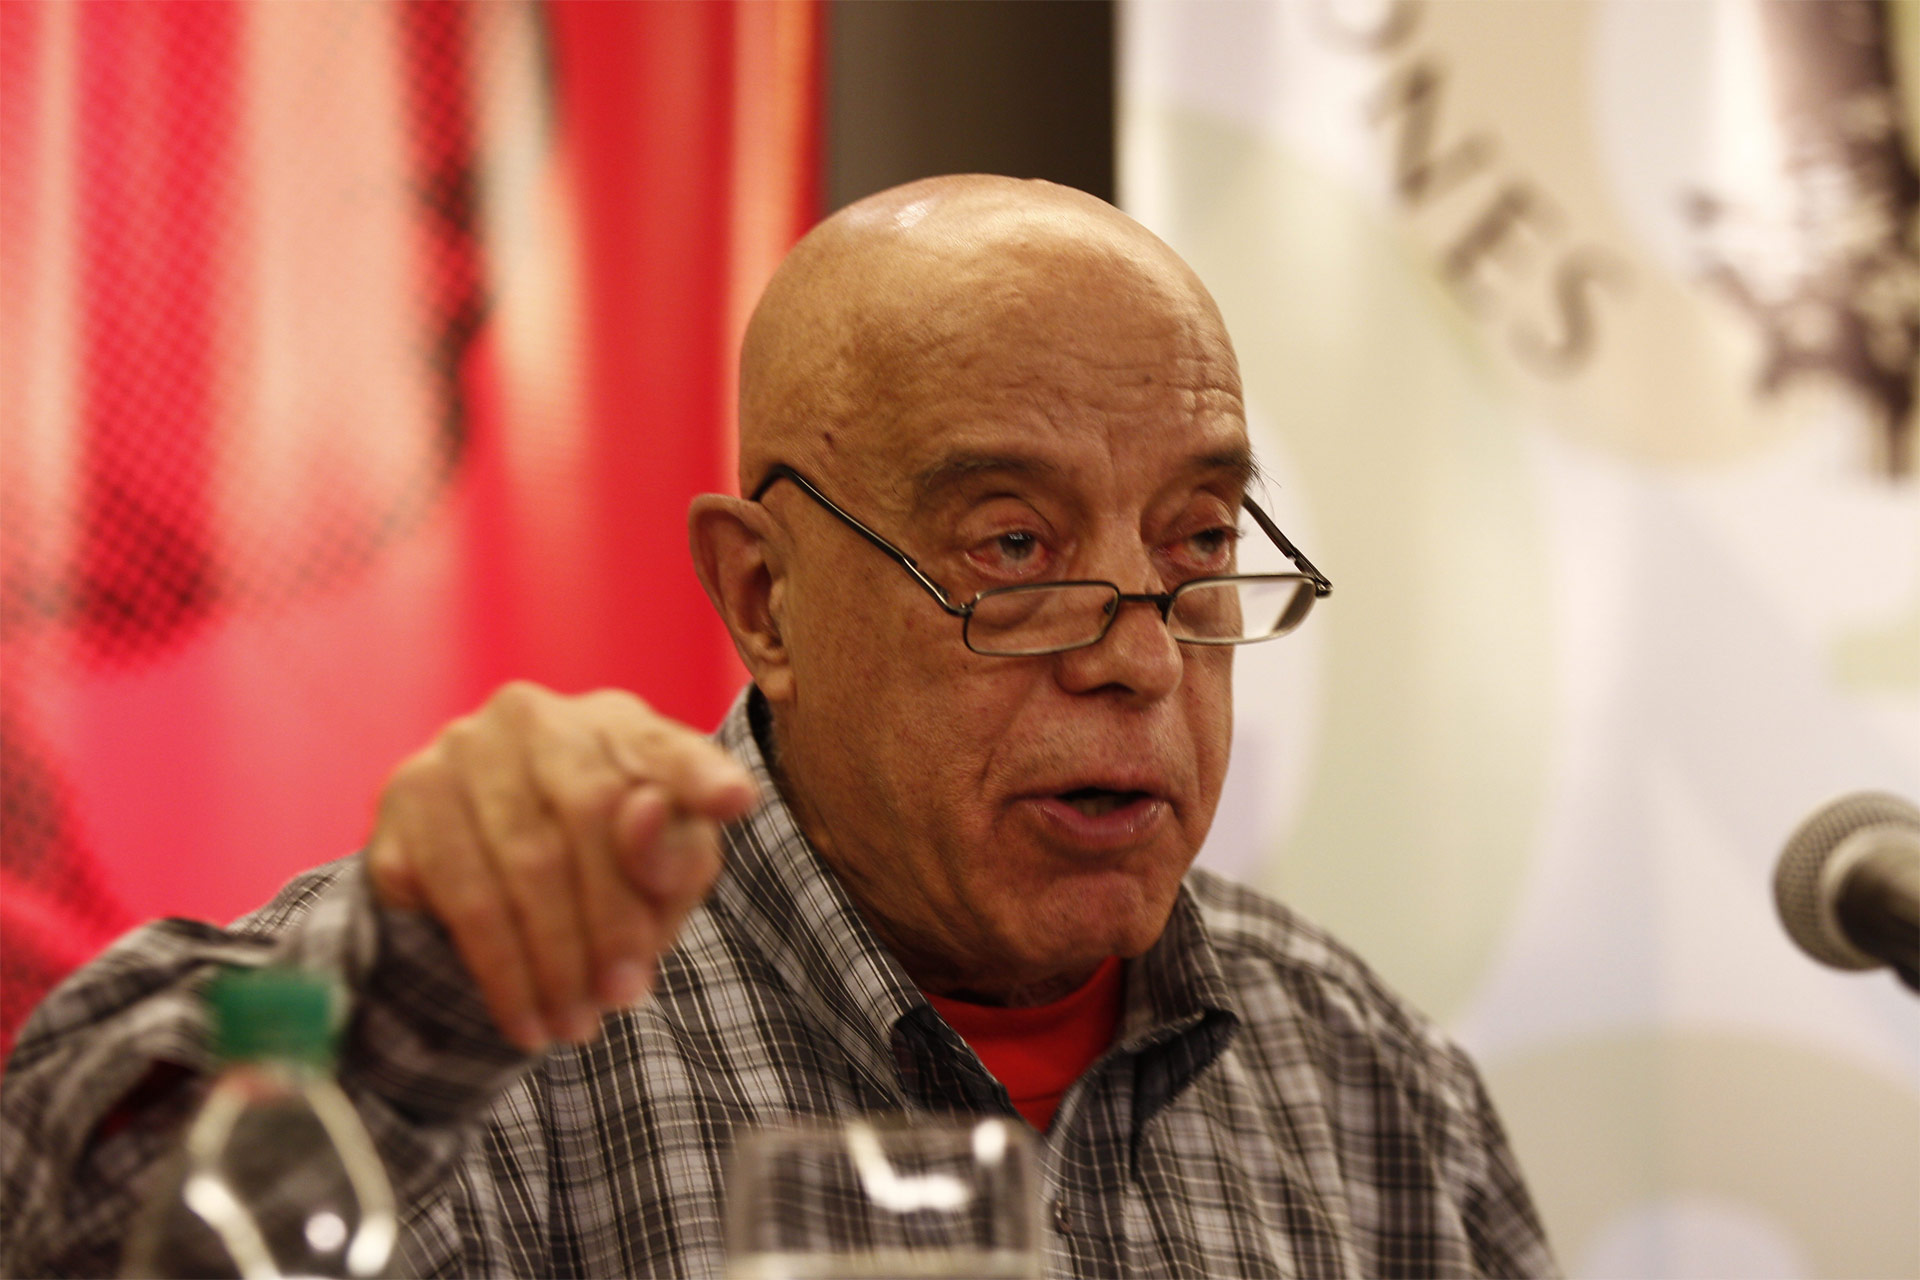 A Héctor Amodio Pérez se le imputaron delitos de privación de libertad, durante la dictadura